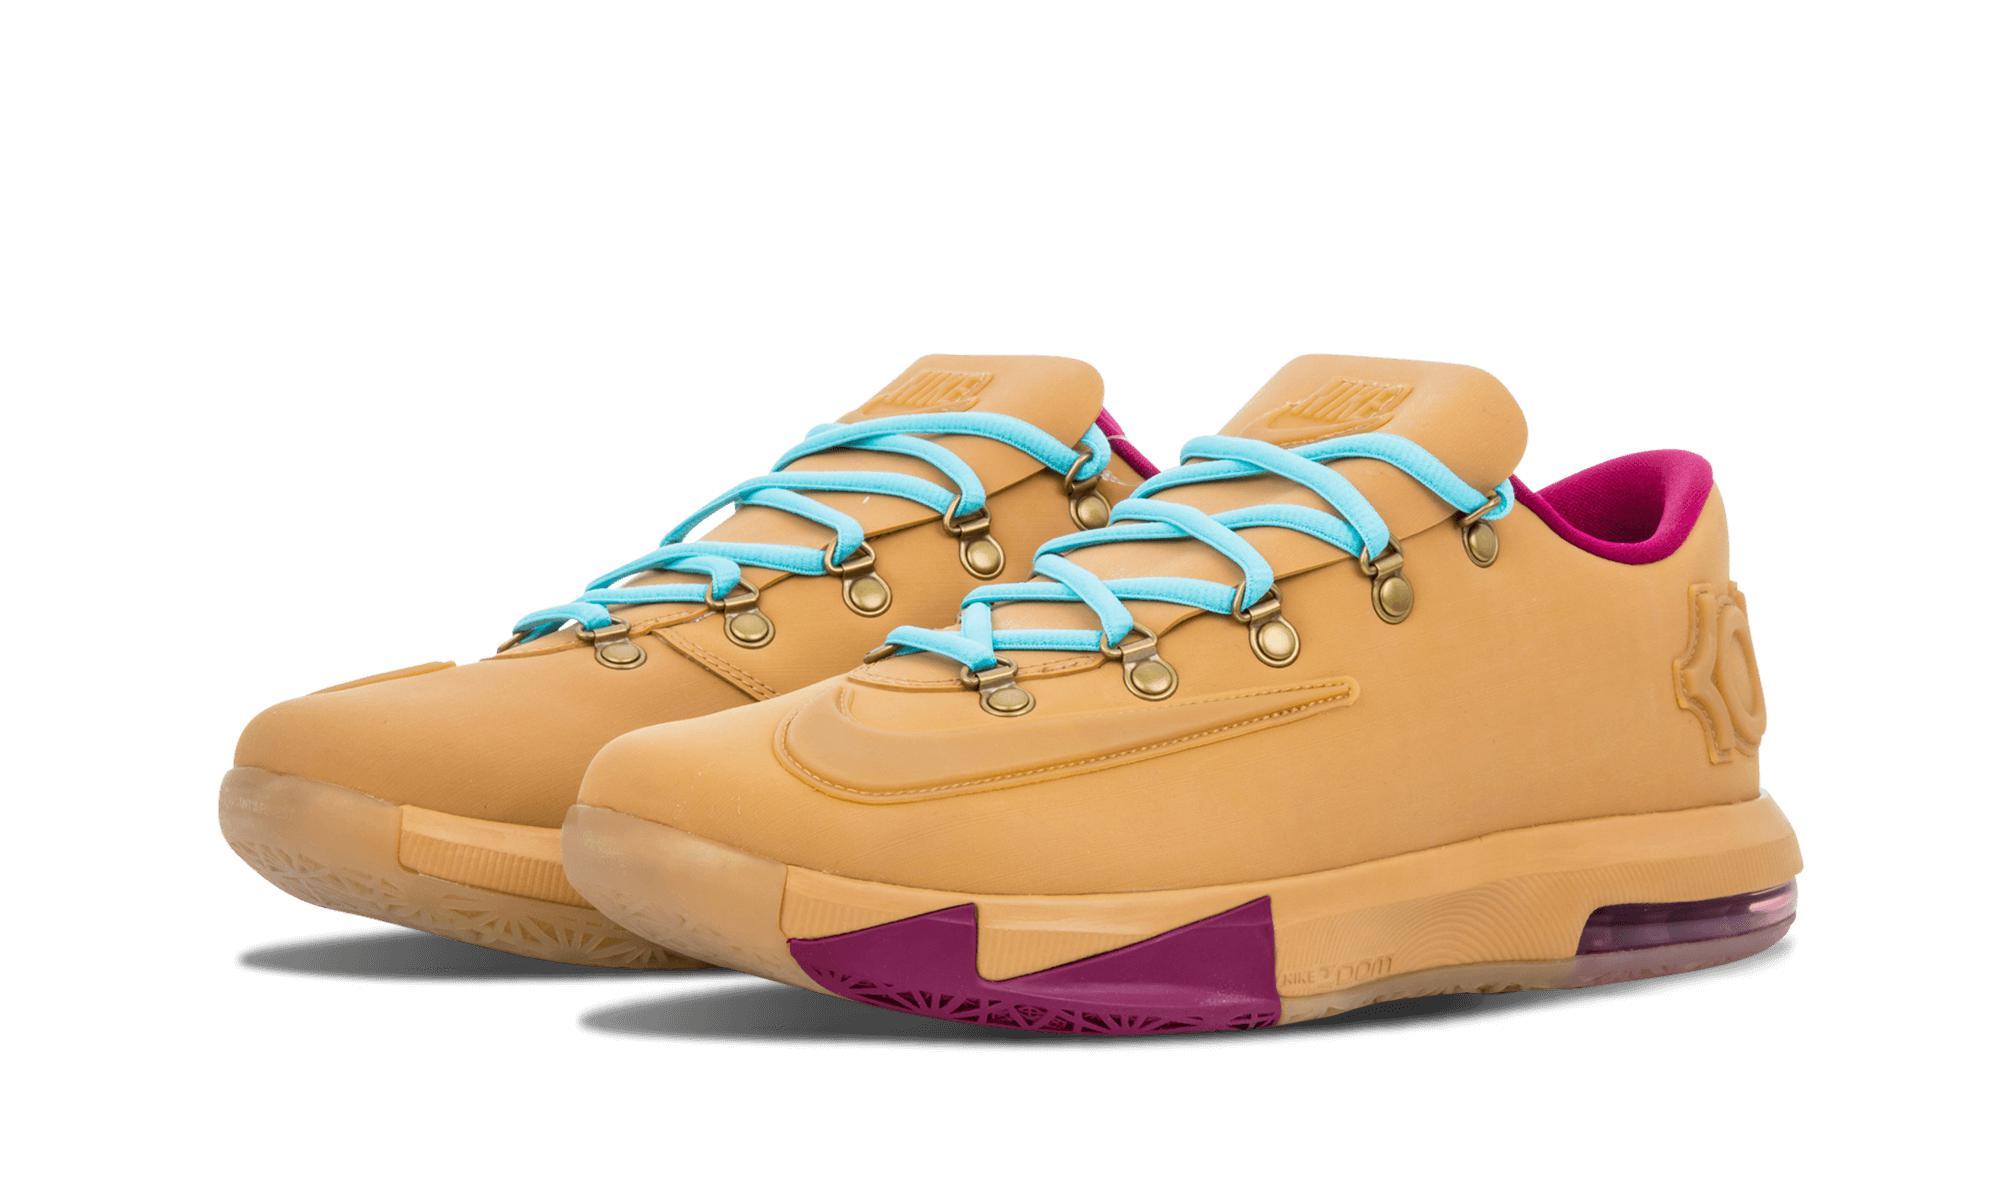 2b35cff314e5 Nike - Multicolor Kd 6 Ext Gum Qs for Men - Lyst. View fullscreen